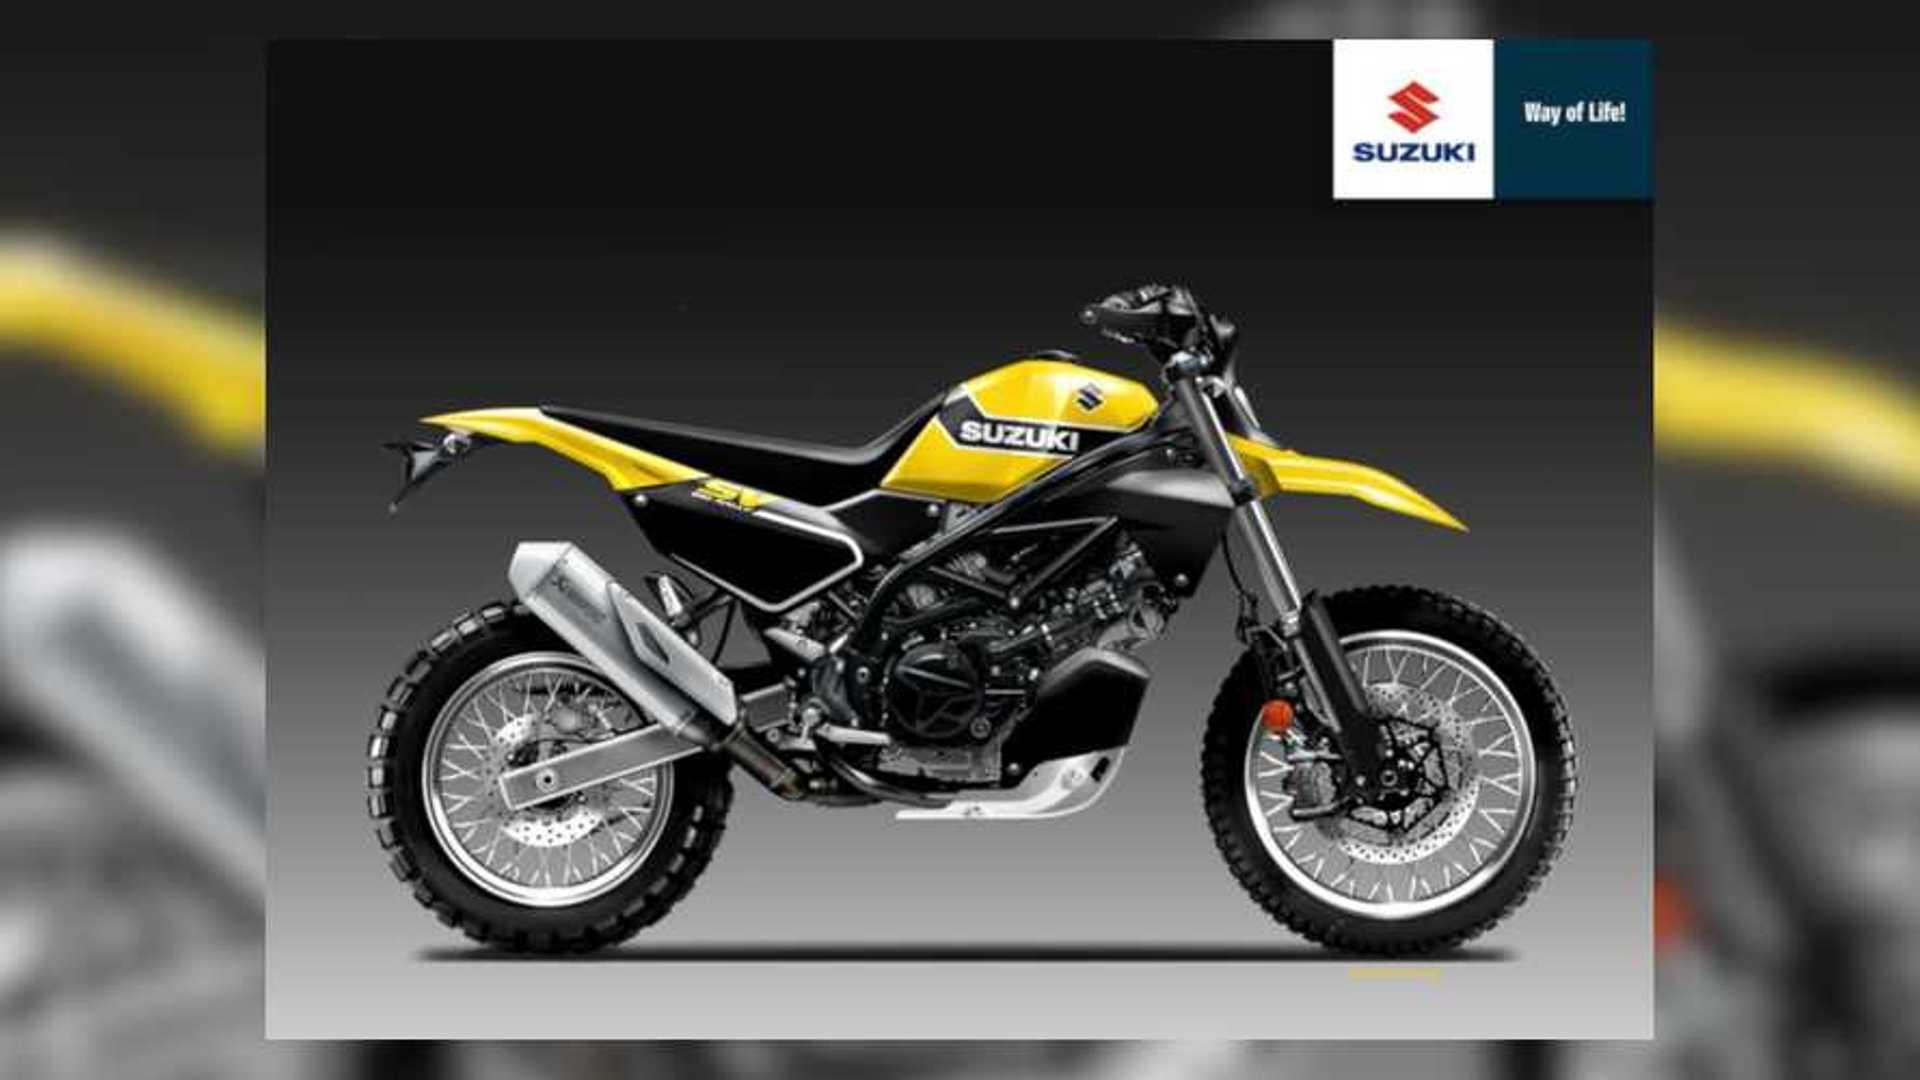 Someone Please Make This Suzuki SV650 Rally Design Real